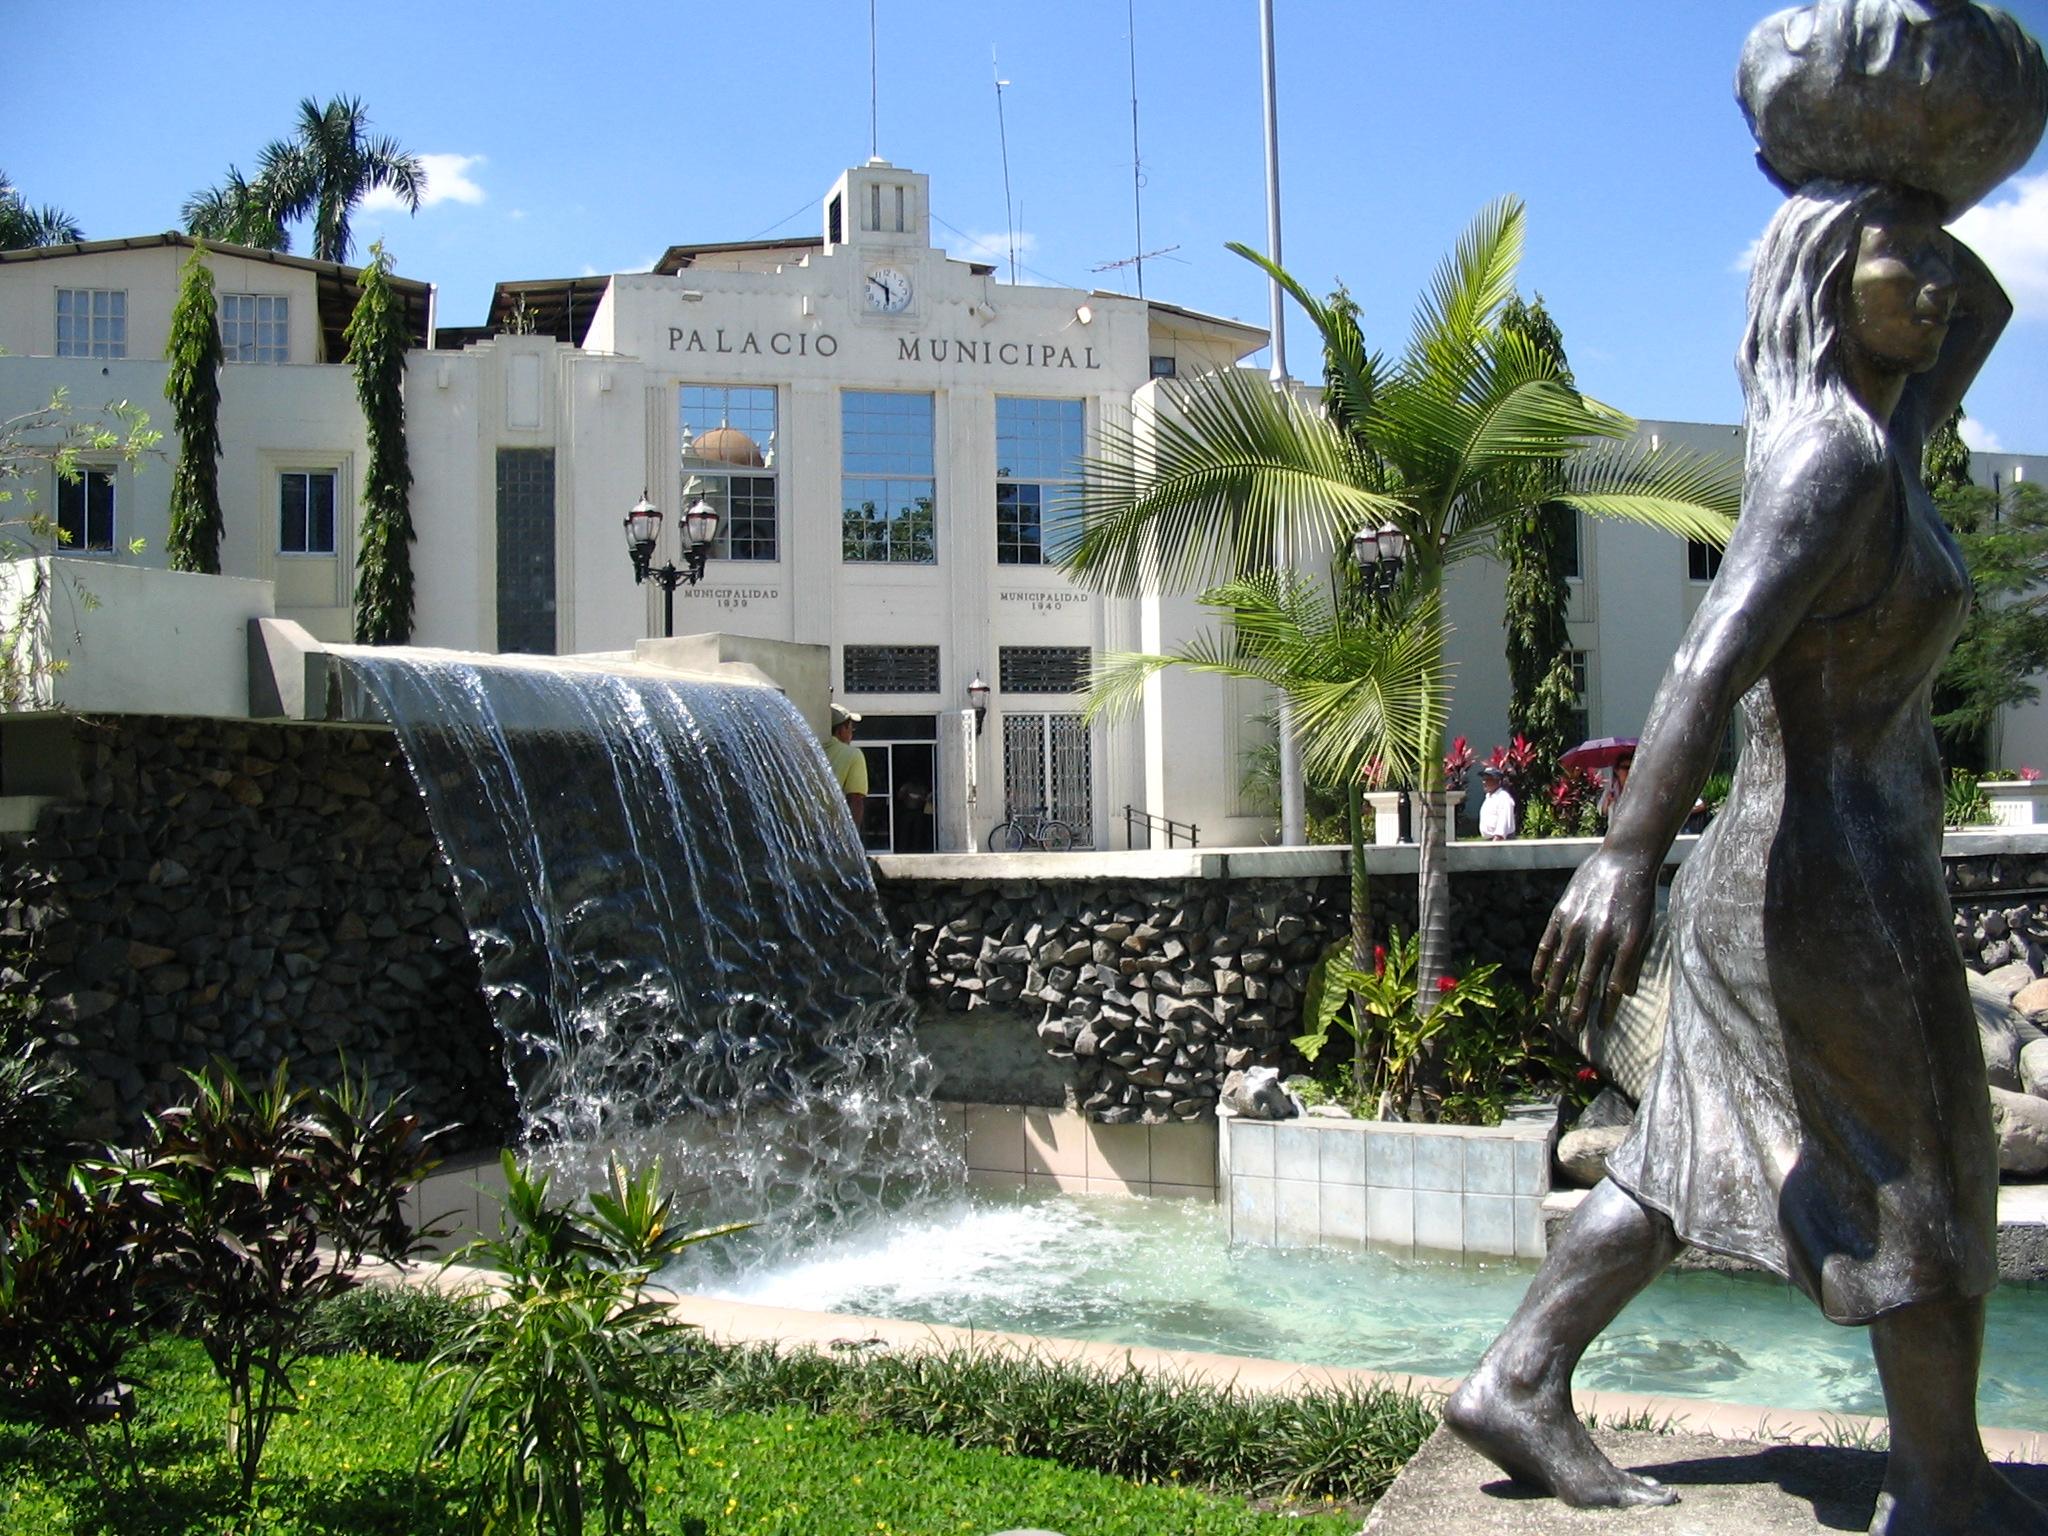 Palacio-municipal-San-Pedro-Sula